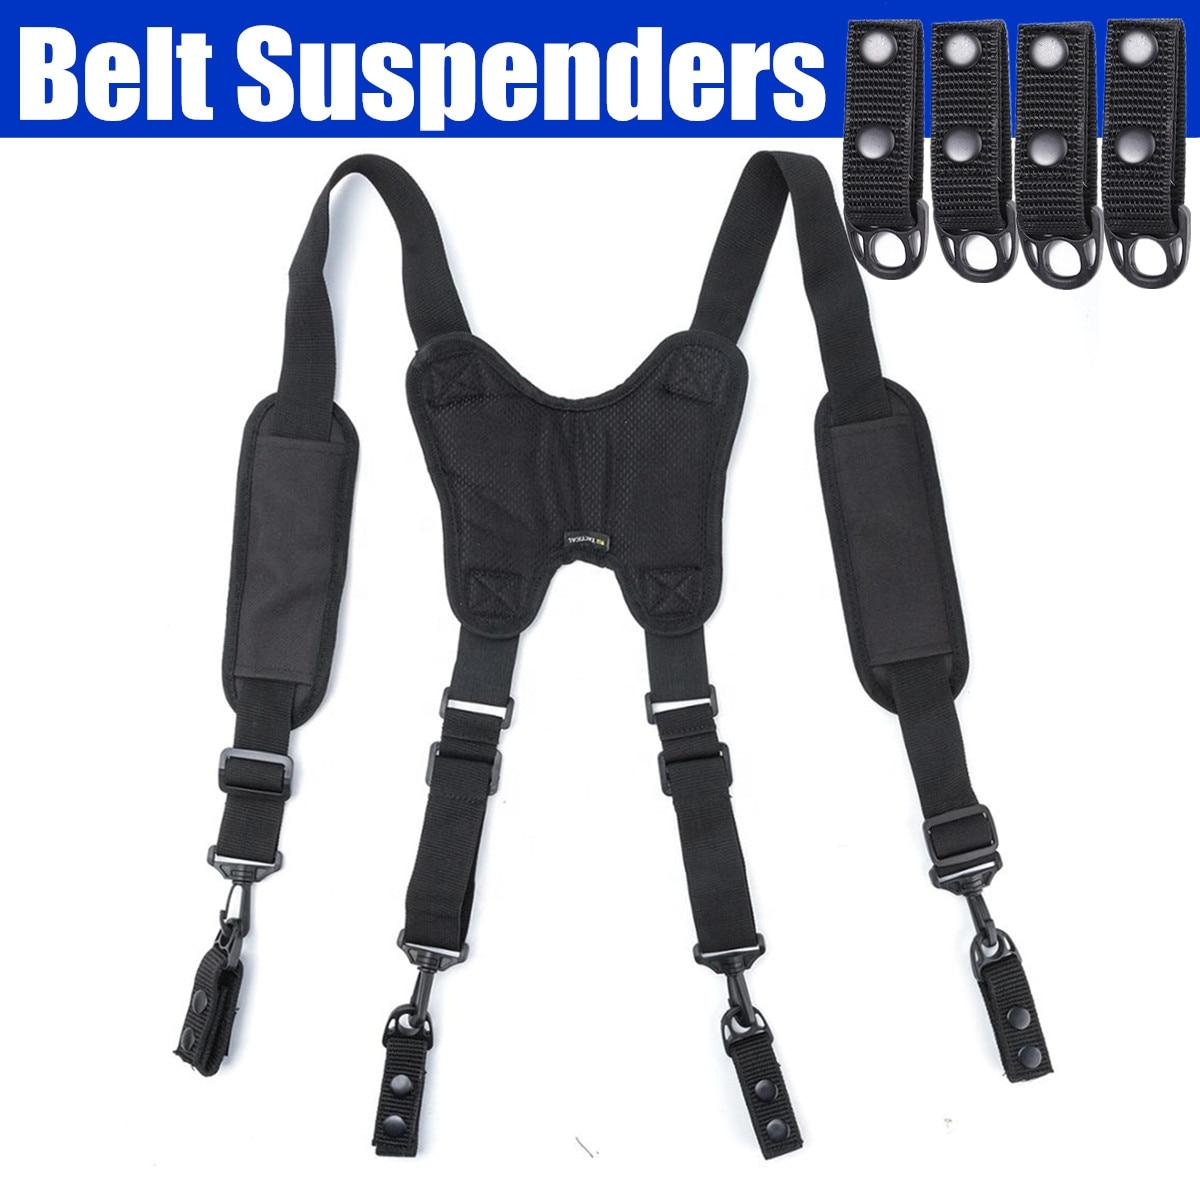 2020 NEW Men Tooling Belt Suspenders Strap To Reduce Waist Weight X Shaped With Suspenders Loop Men's Suspenders Adjustable